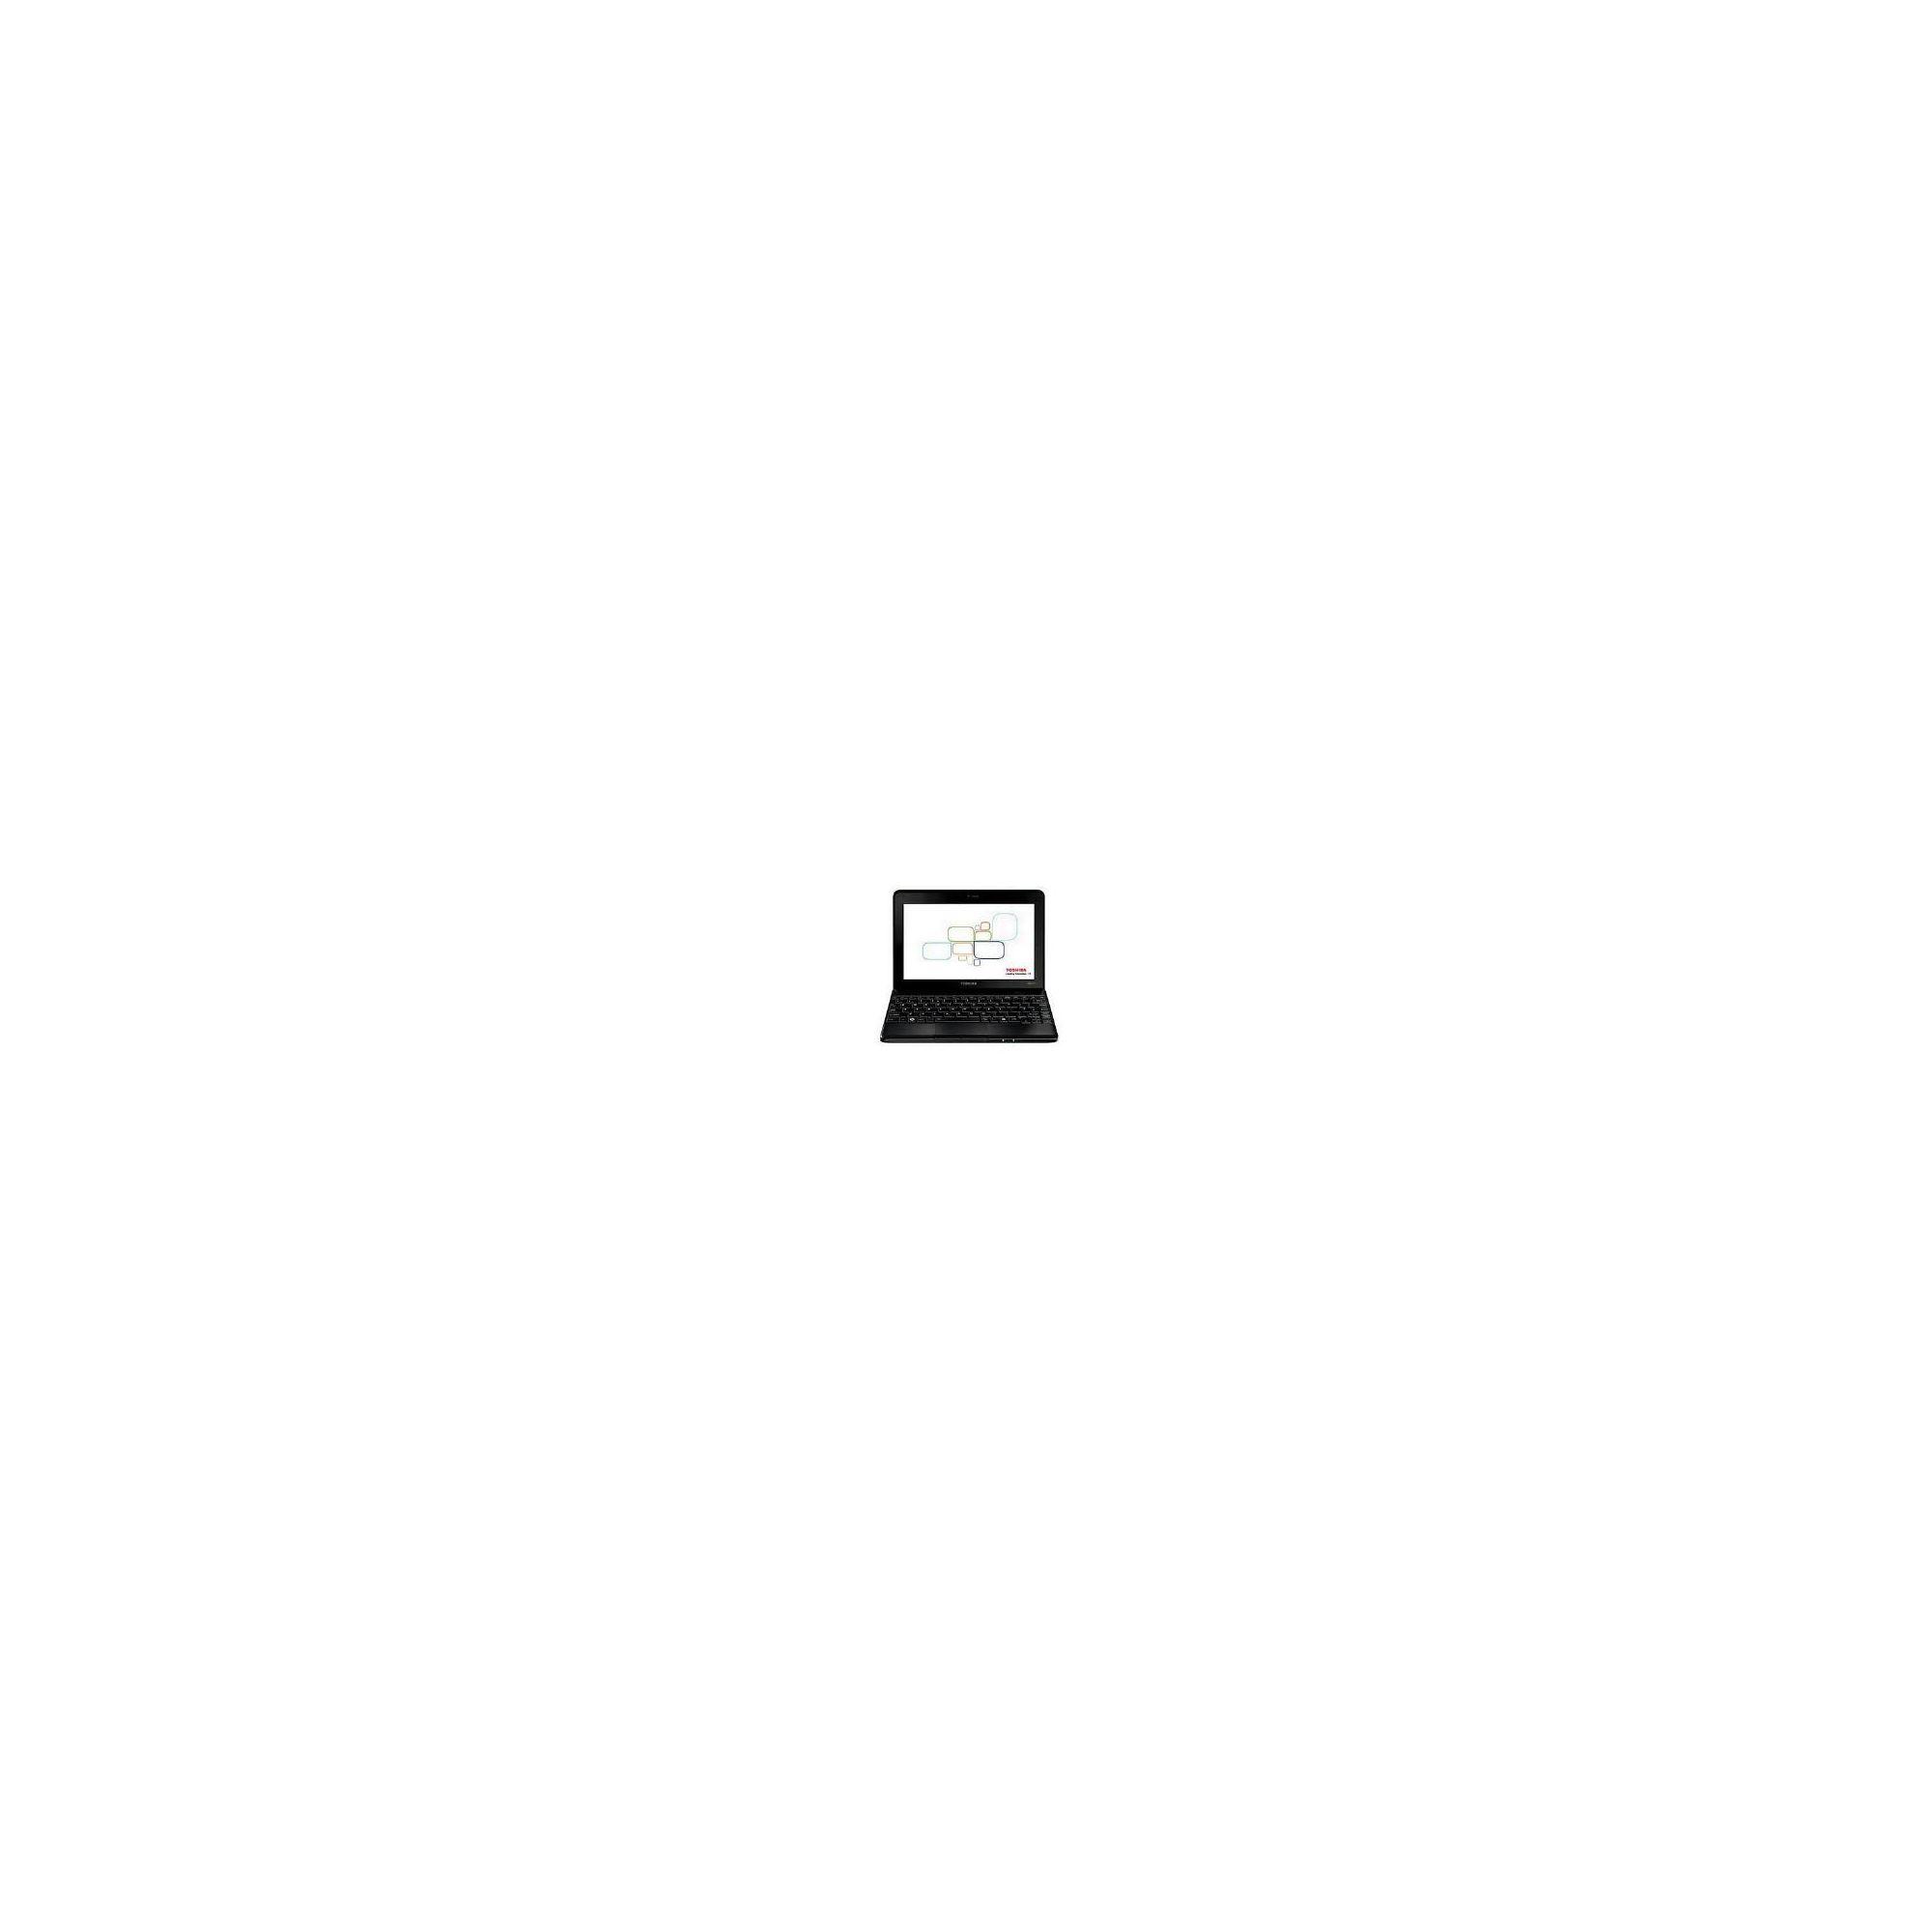 Toshiba NB510-11J (10.1 inch) Netbook PC Intel Atom (N2600) at Tesco Direct